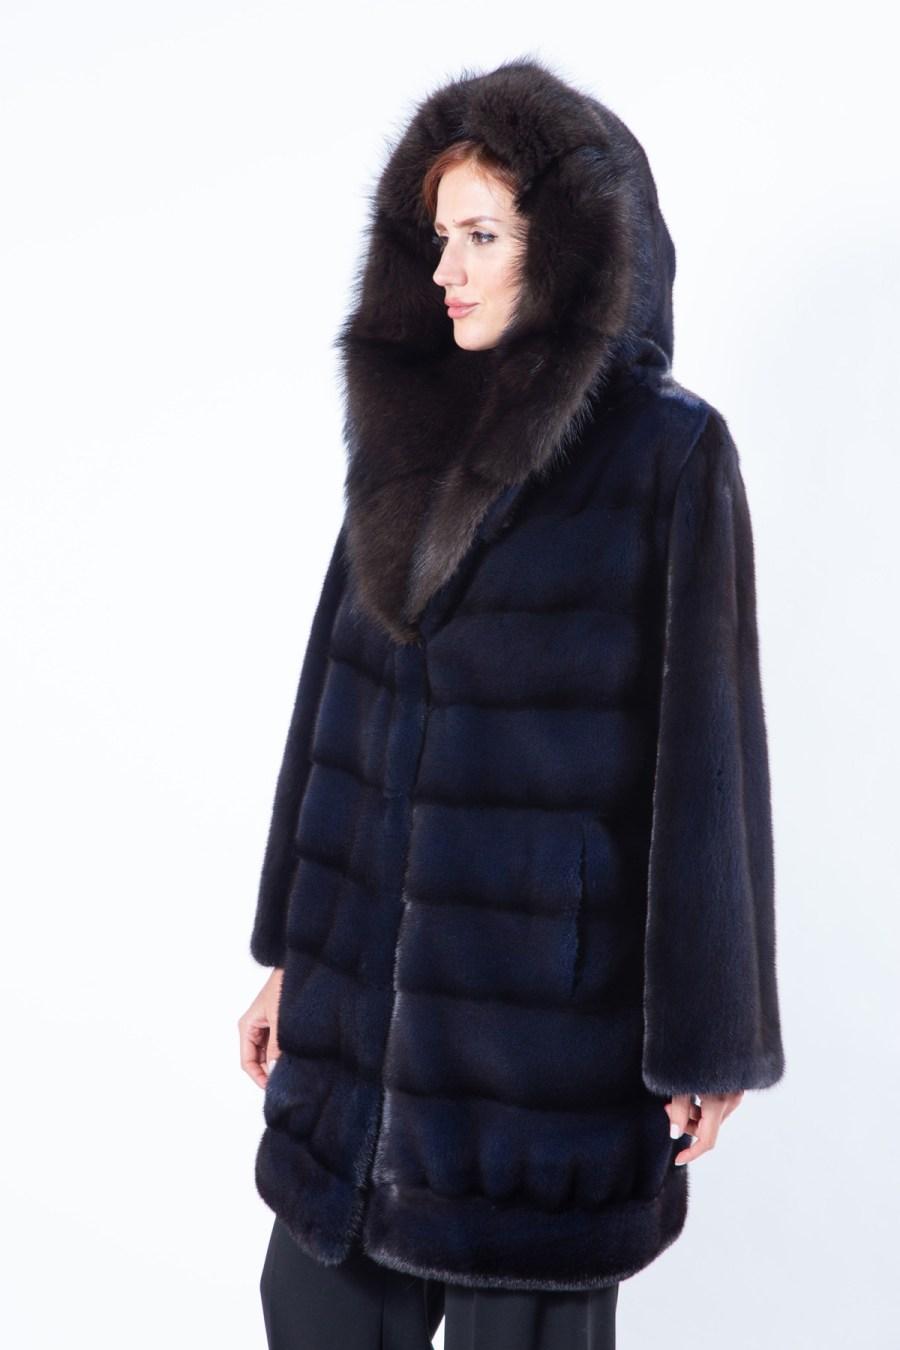 Royal Blue Mink Fur Jacket with Hood | Пальто из меха норки цвета Royal Blue с капюшоном - Sarigianni Furs